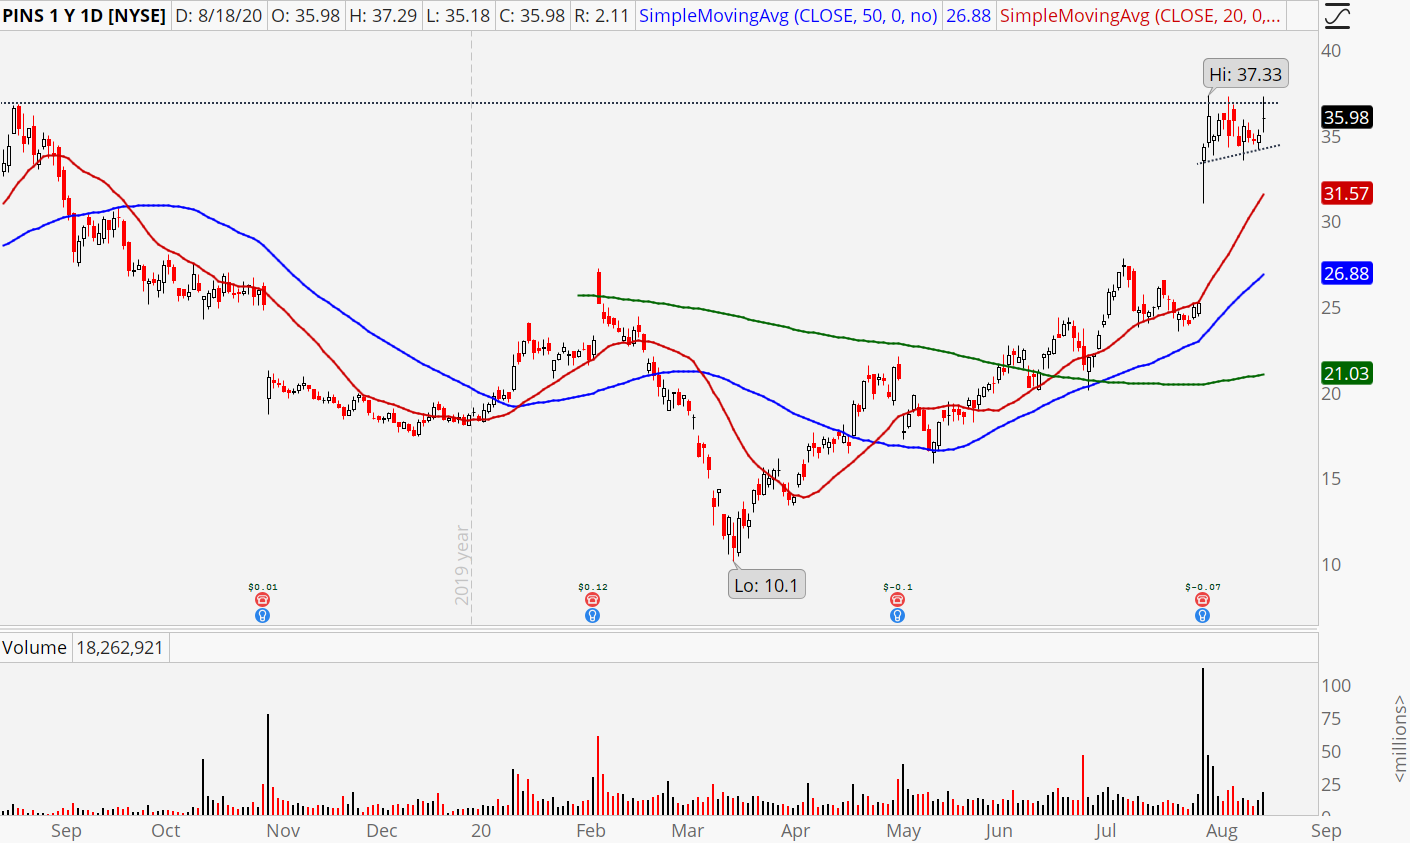 Pinterest (PINS) stock chart showing imminent breakout